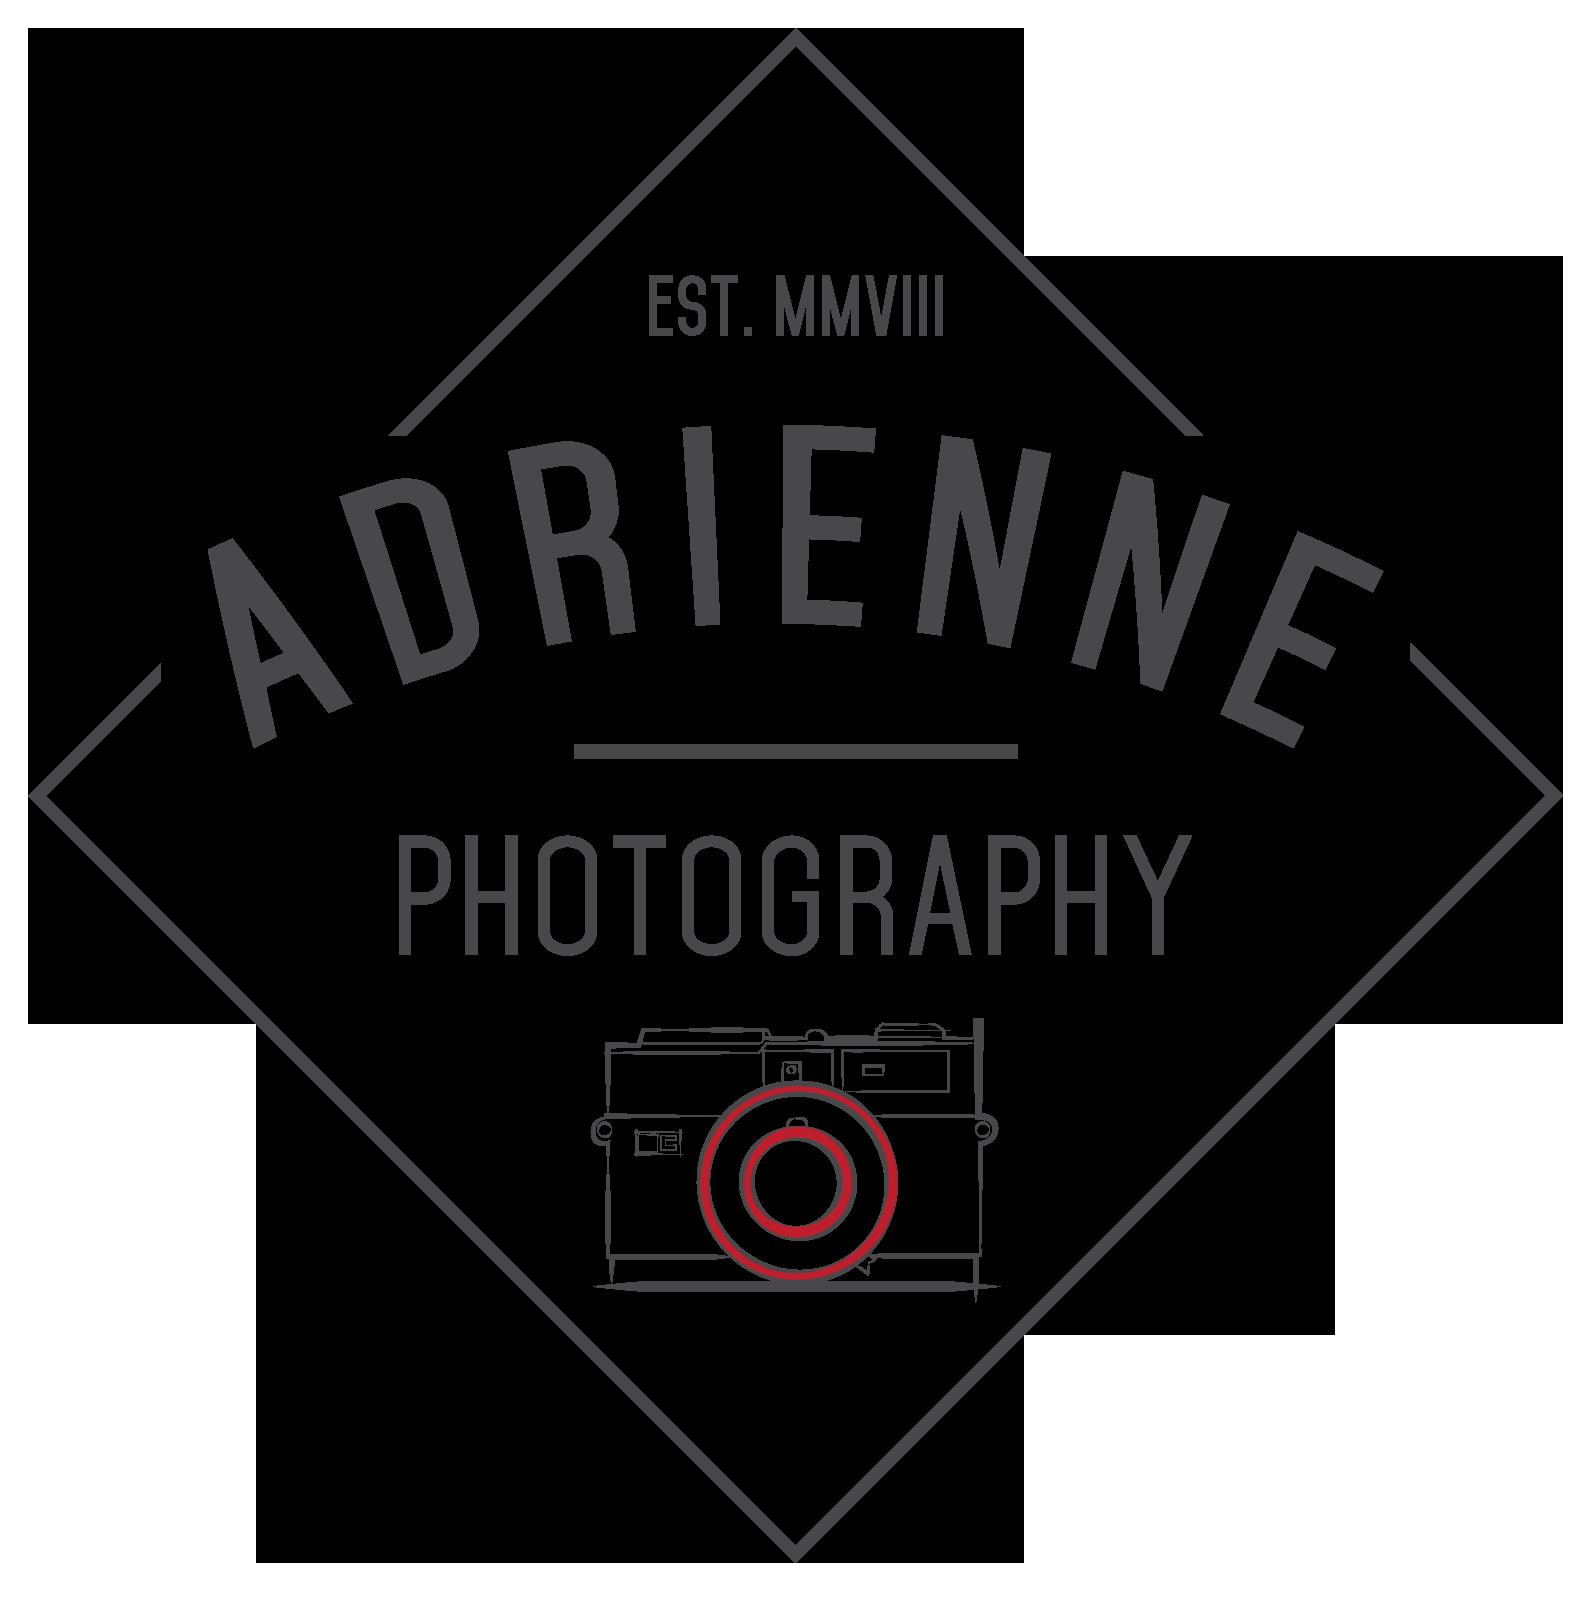 logo-adrienne-photography.jpg